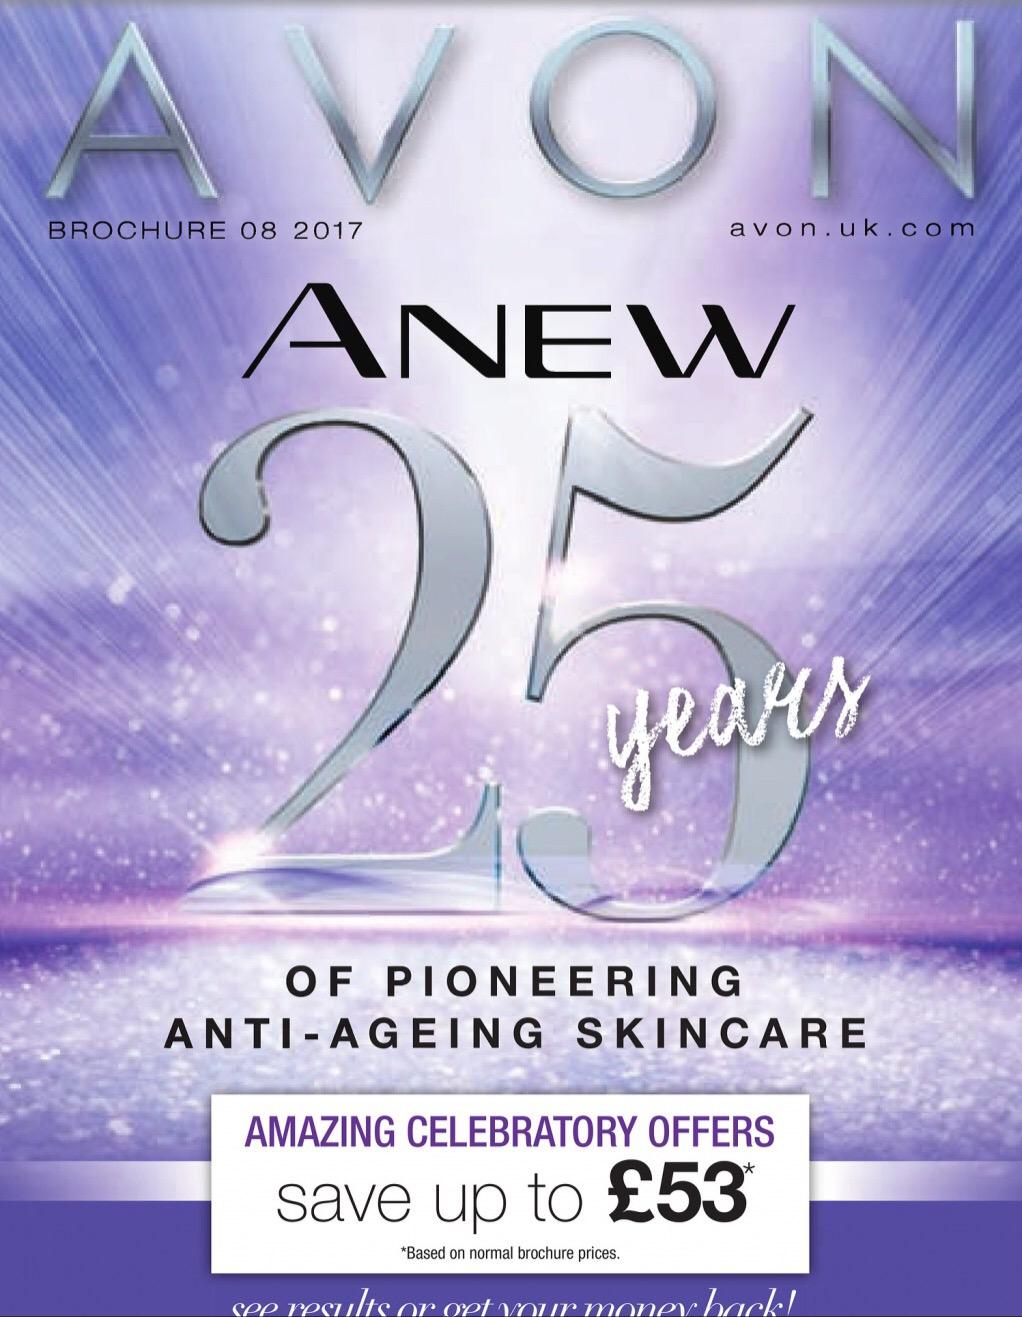 Avon Campaign 8 2017 Brochure Online UK | Join Avon